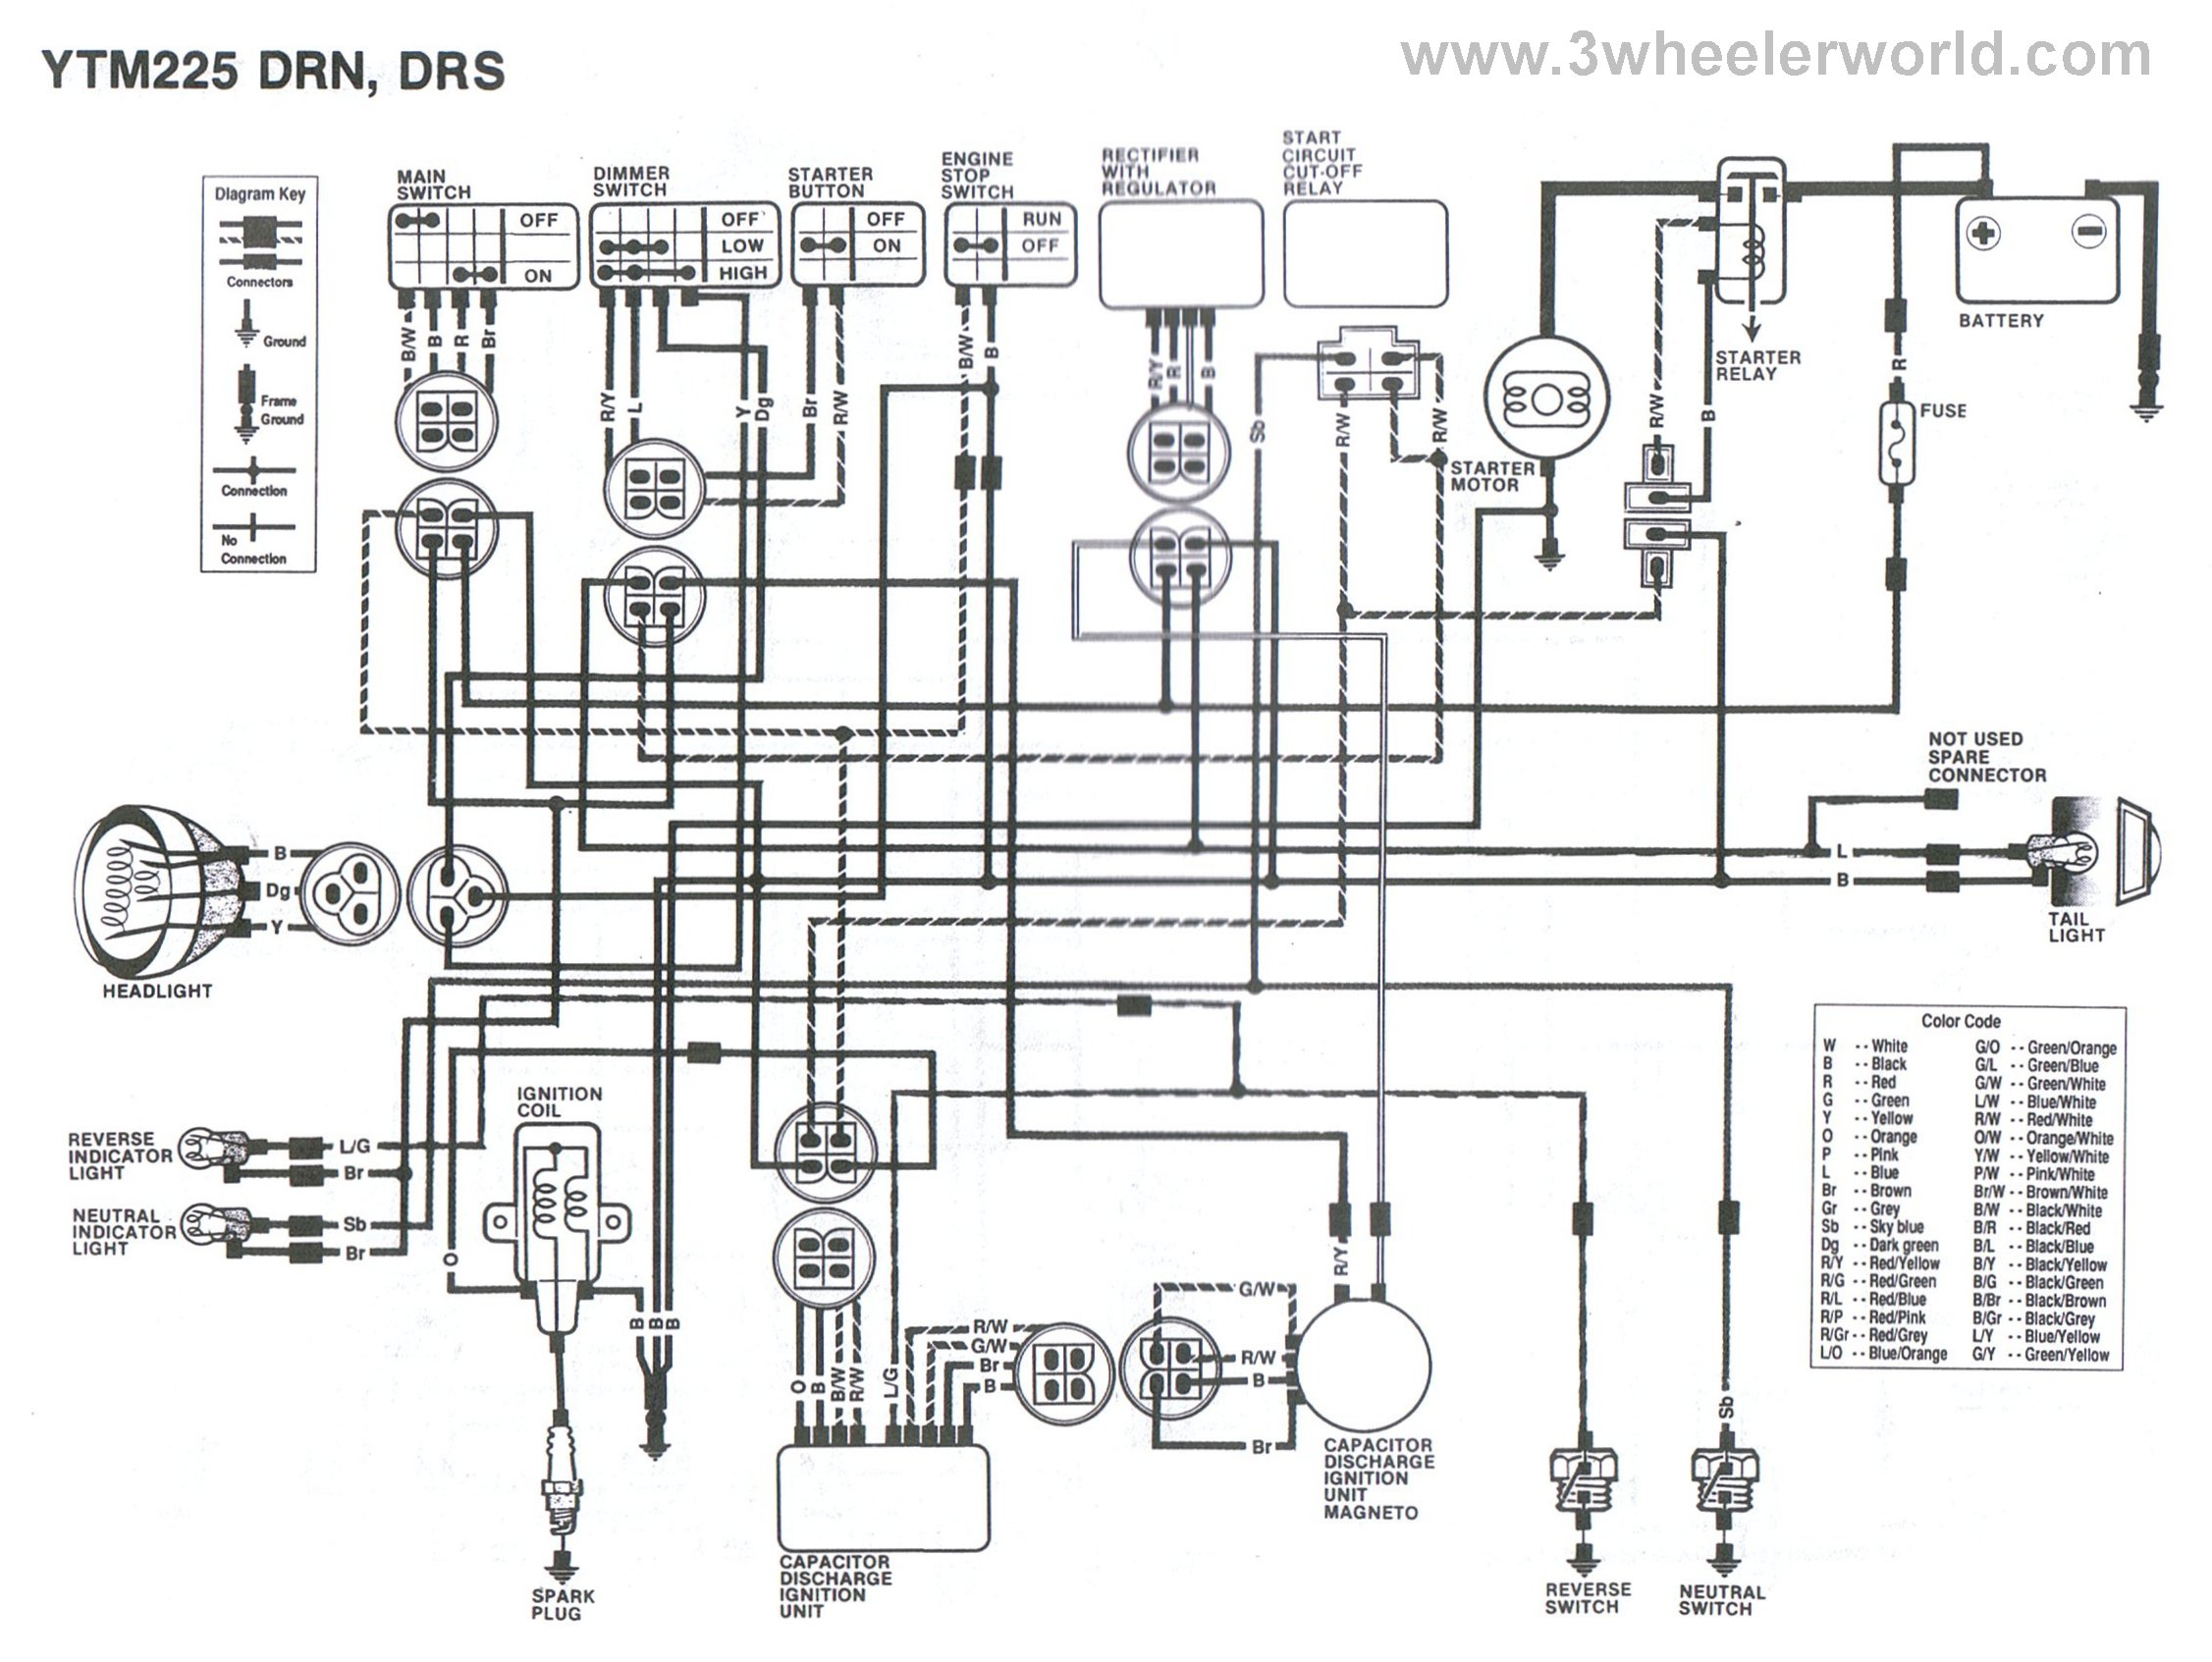 97 Chevy S10 Wiring Diagram Besides Nissan Pathfinder 4x4 Further